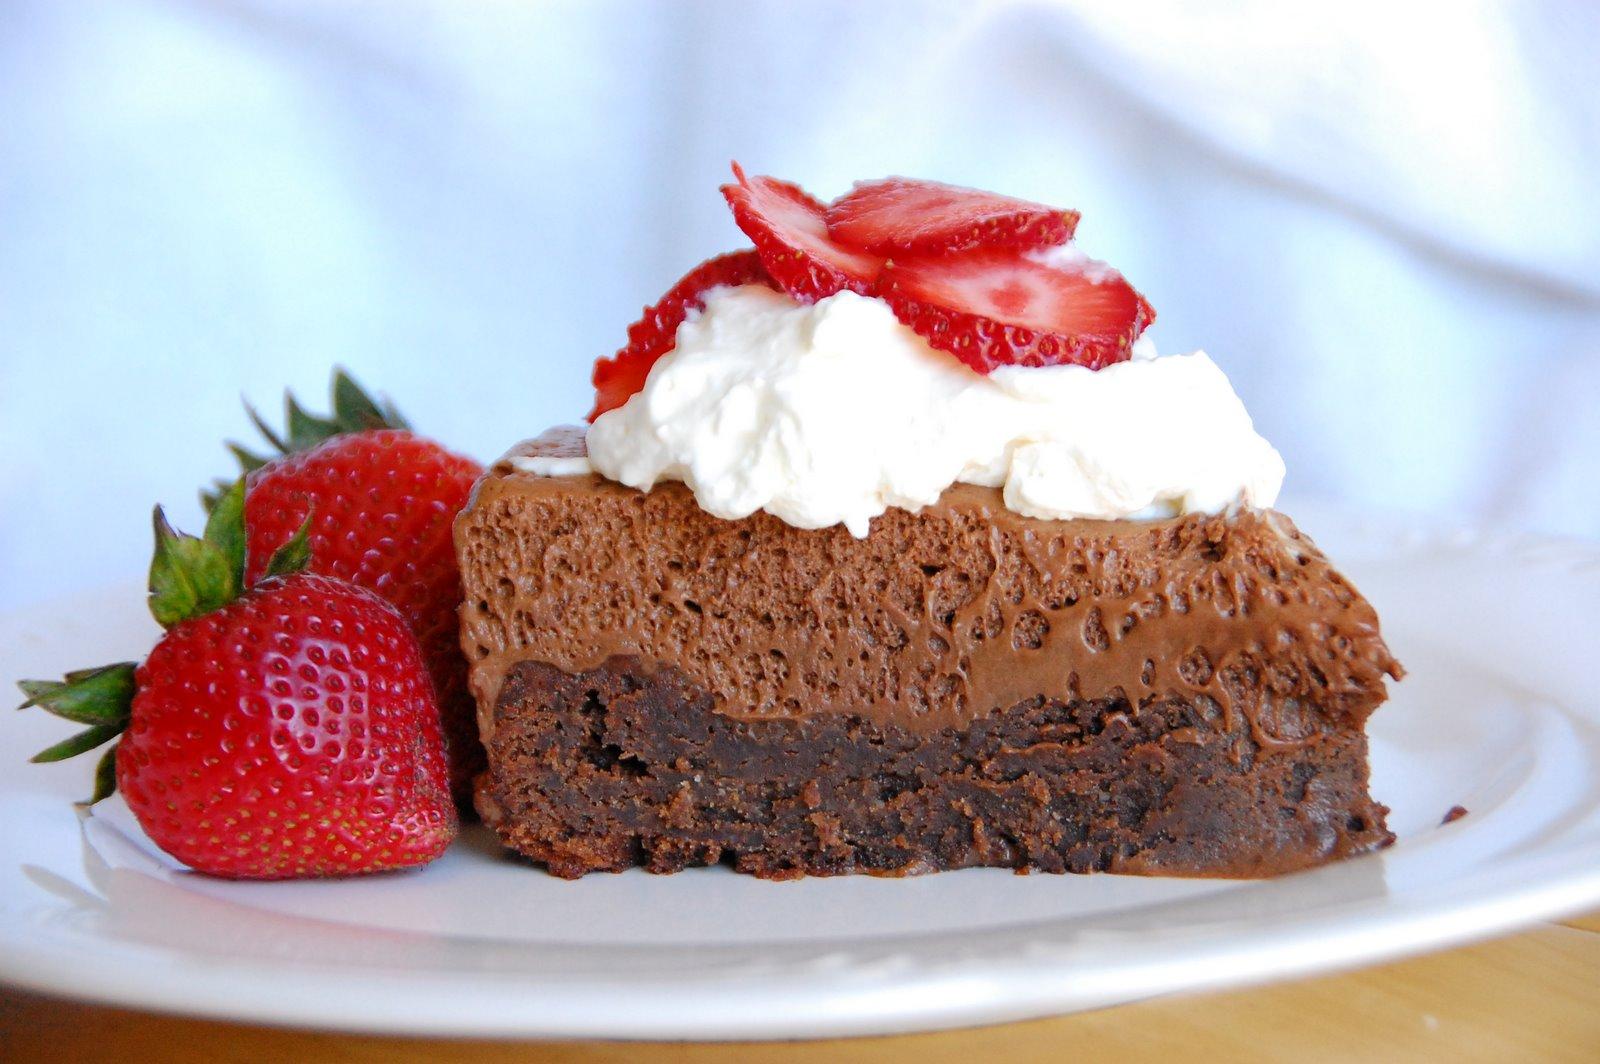 Chocolate Torte from Heaven